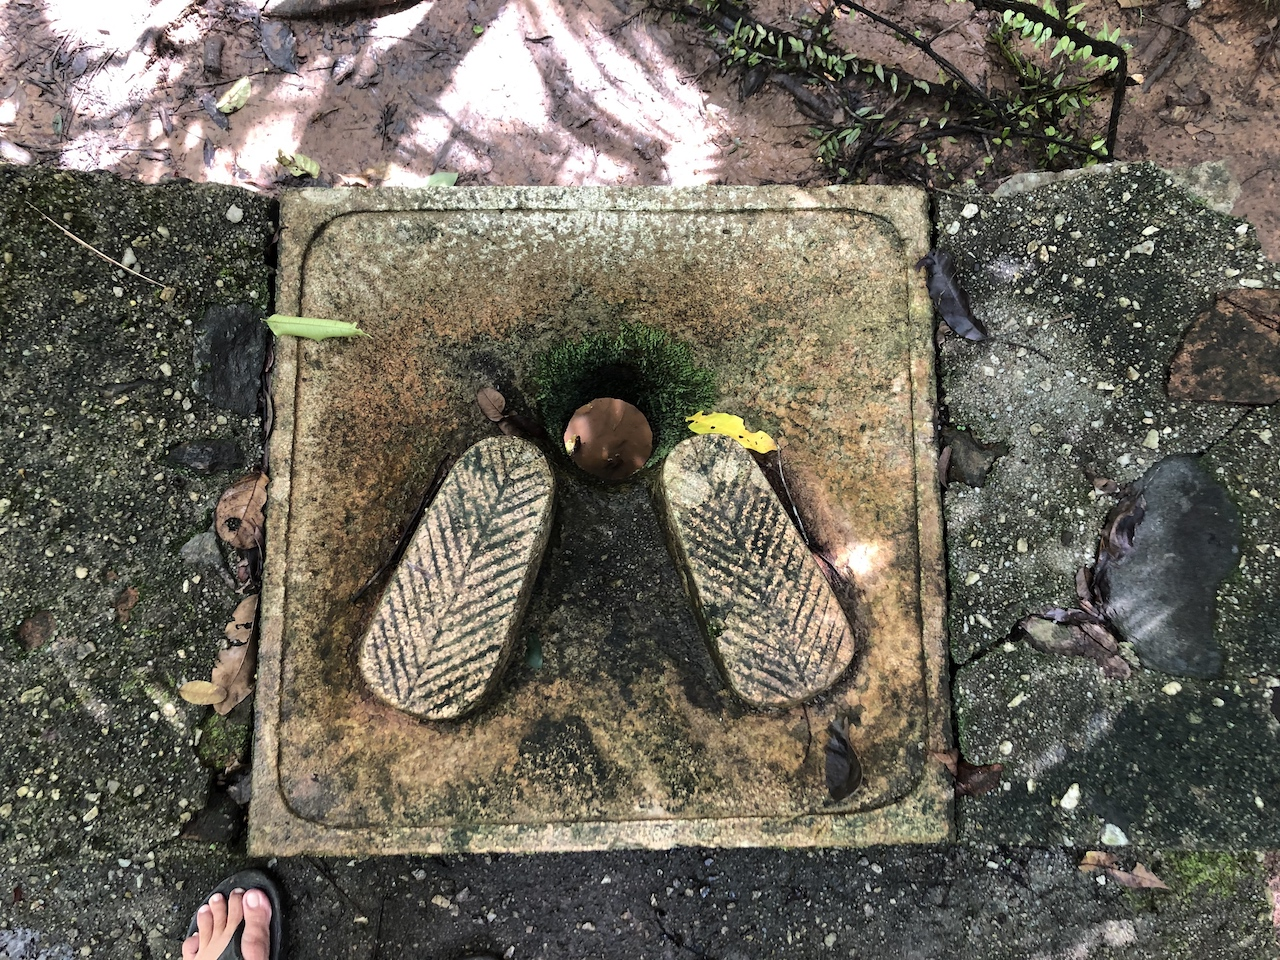 jungle prison feet.jpg